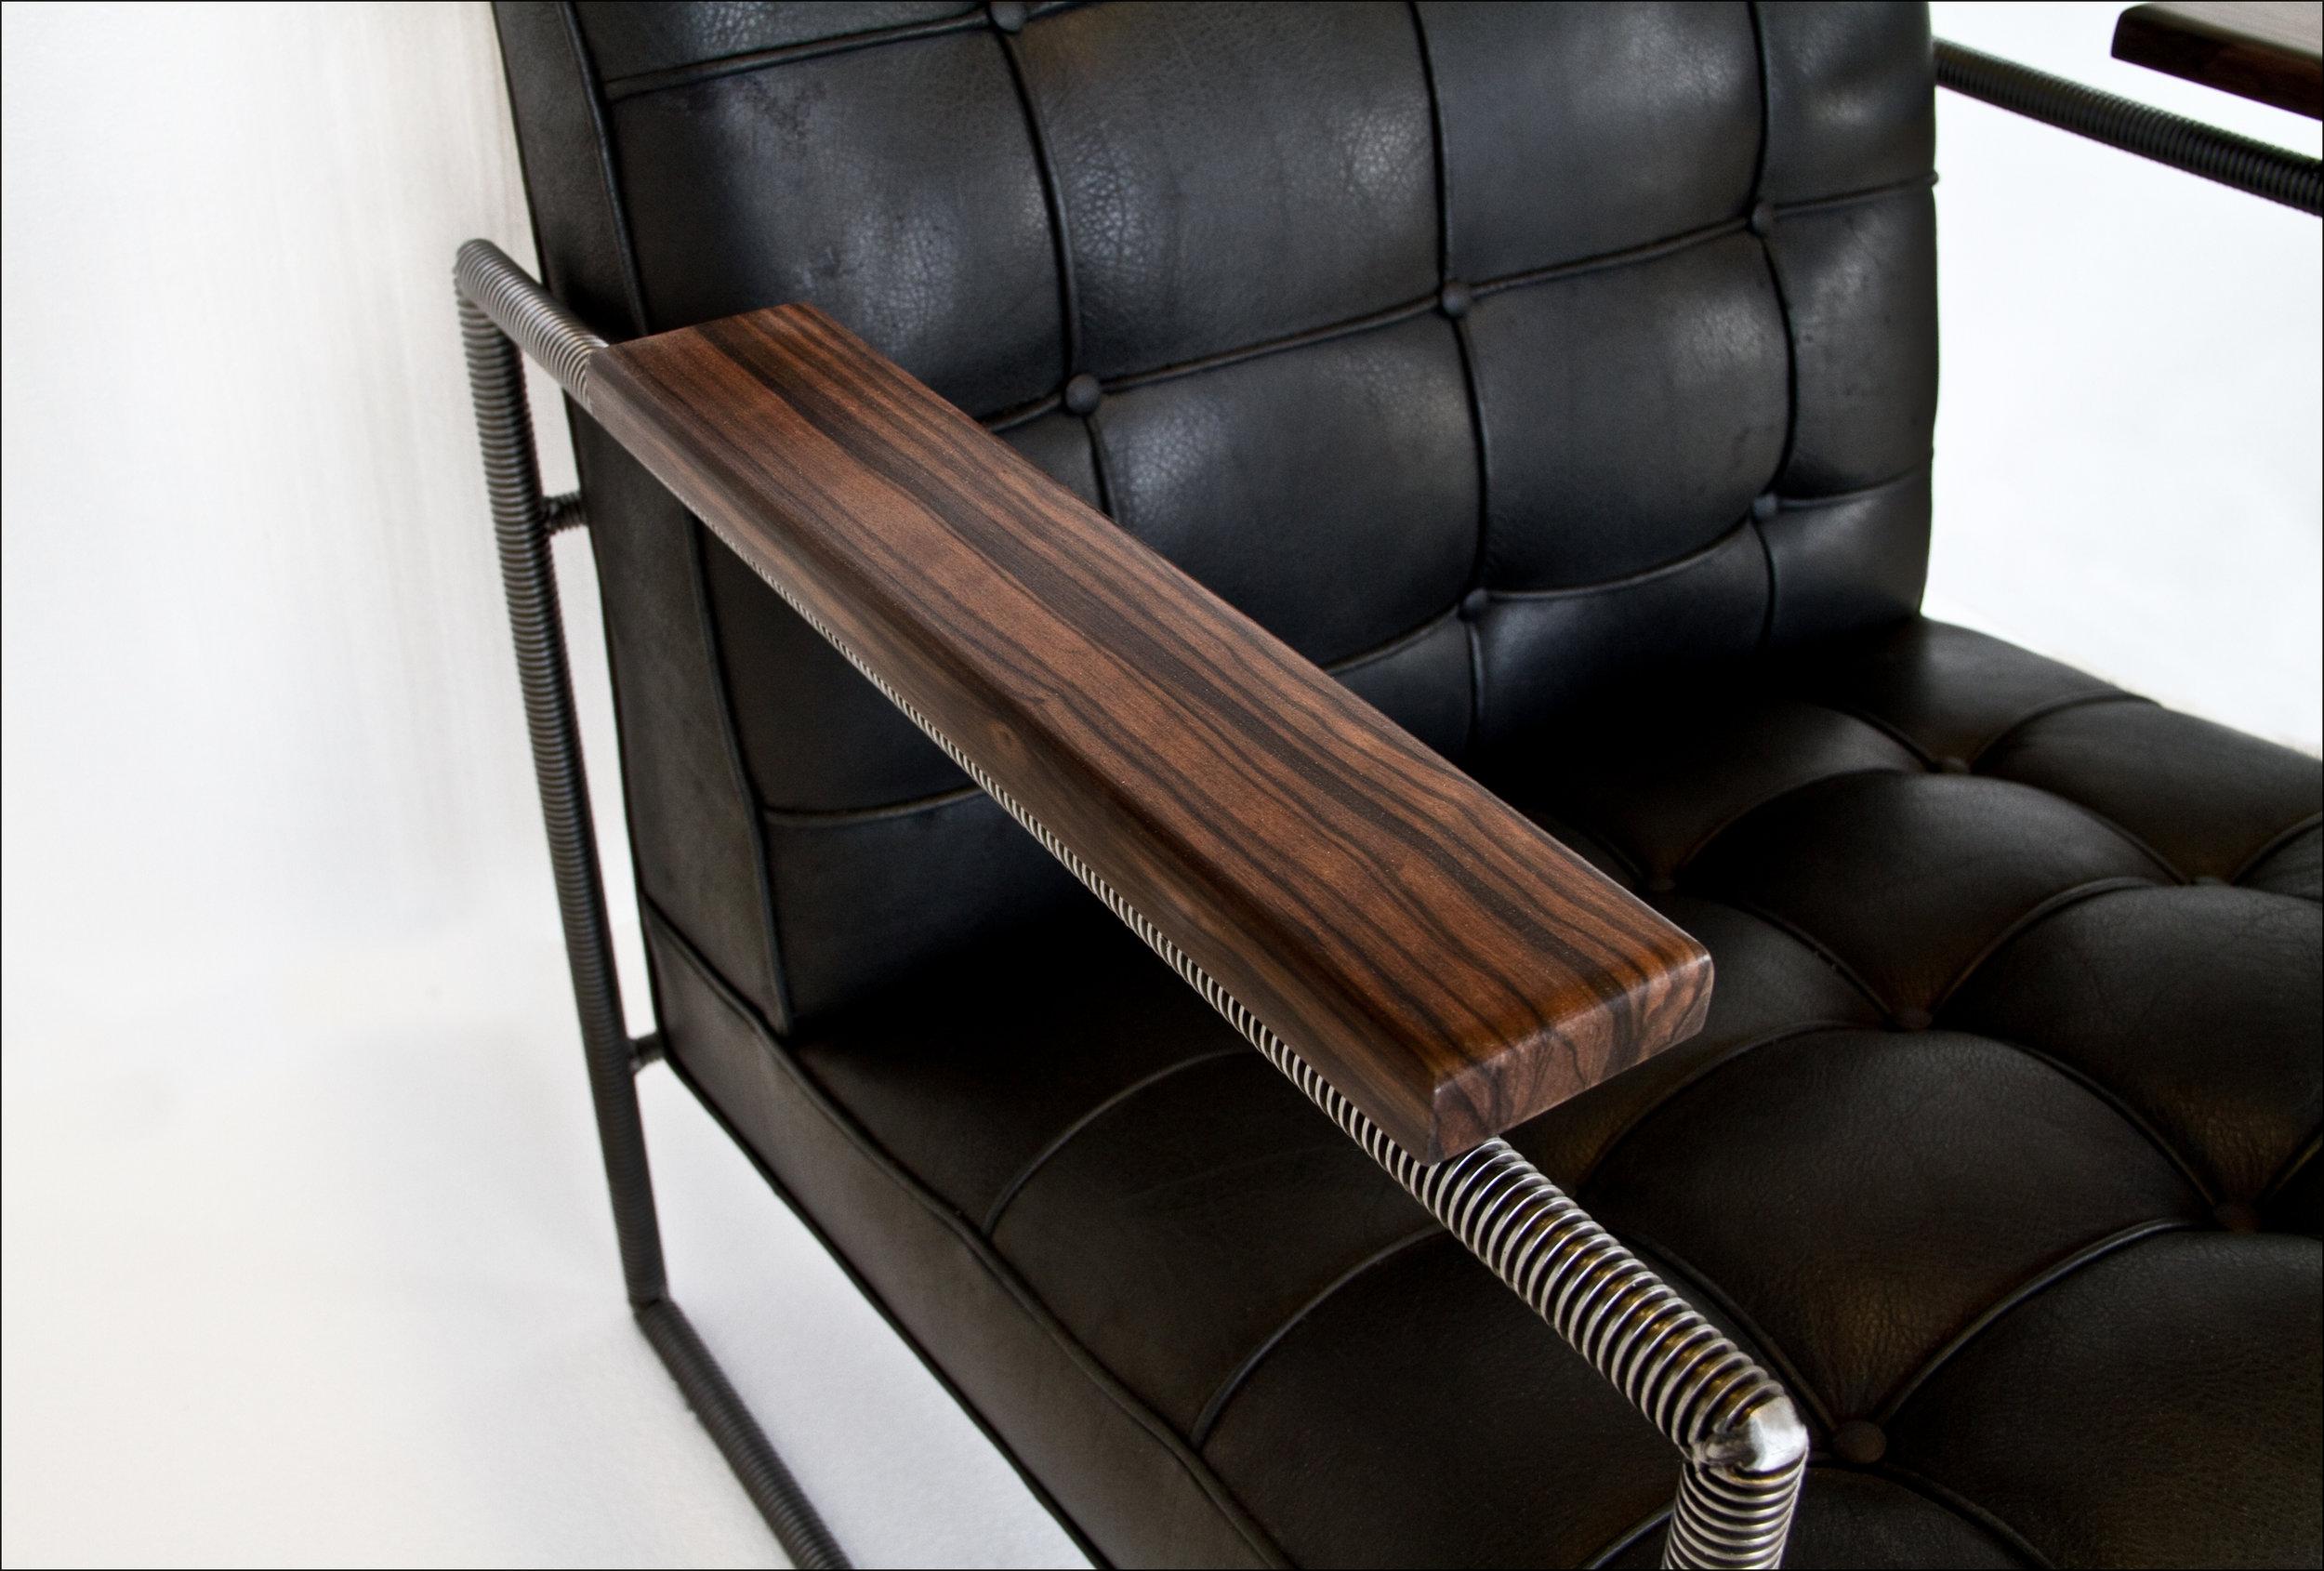 1935 chair detail olga guanabara richard velloso.jpg